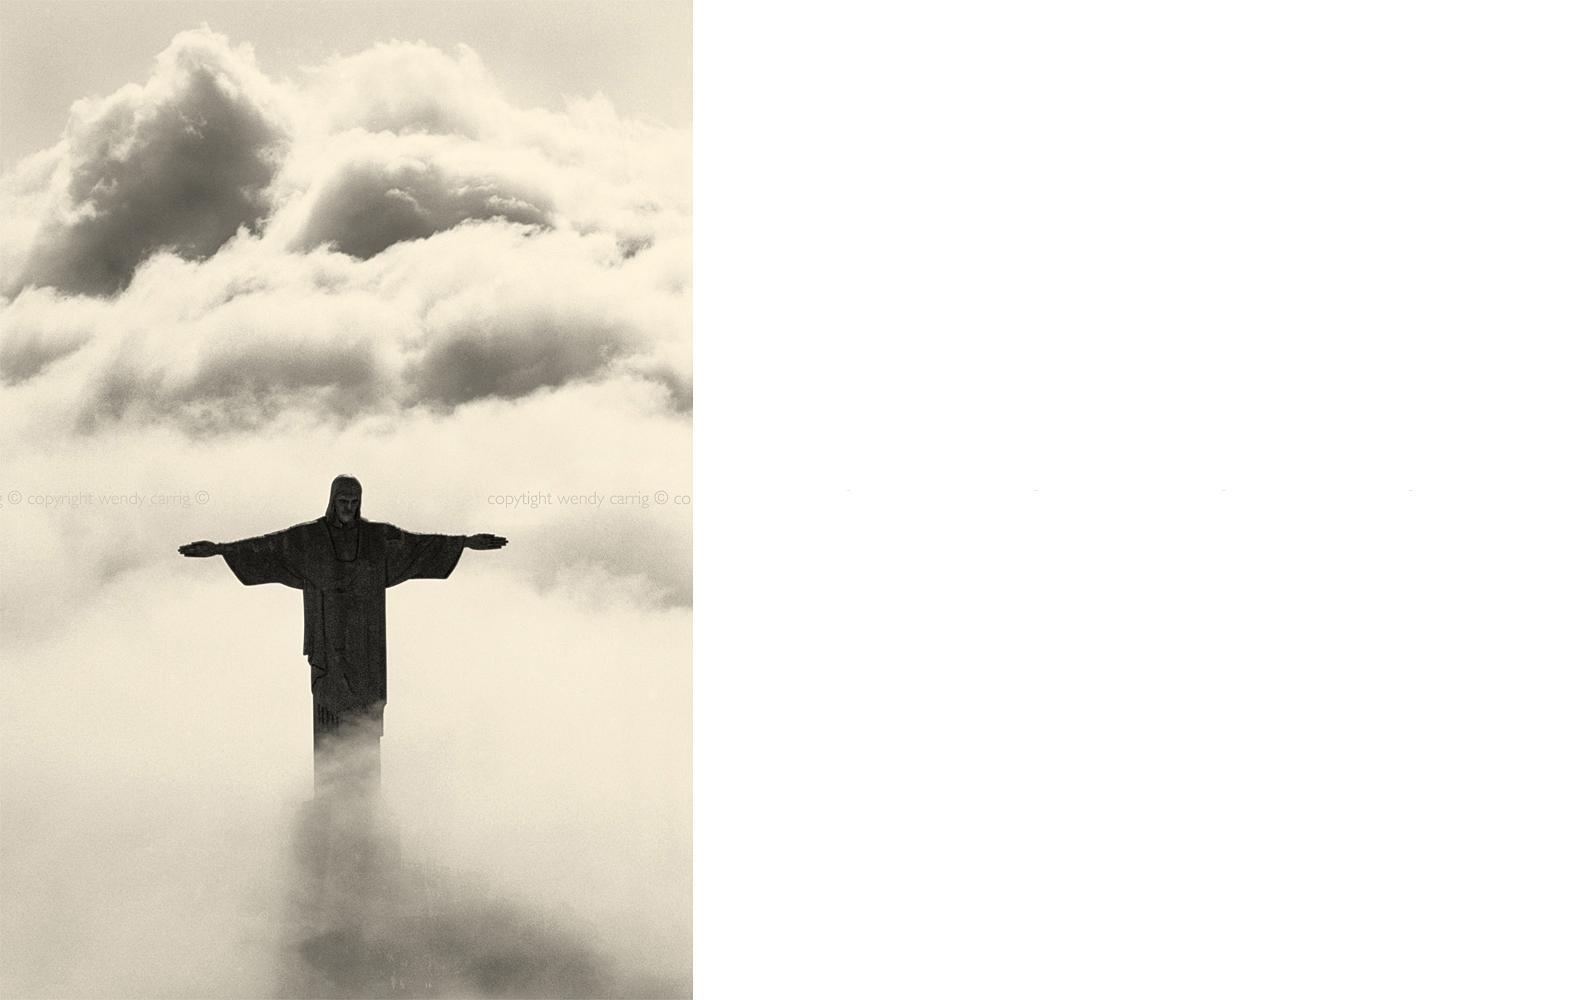 Christ the redeemer, rio de janeiro, photography © copyright wendy carrig, elle decoration